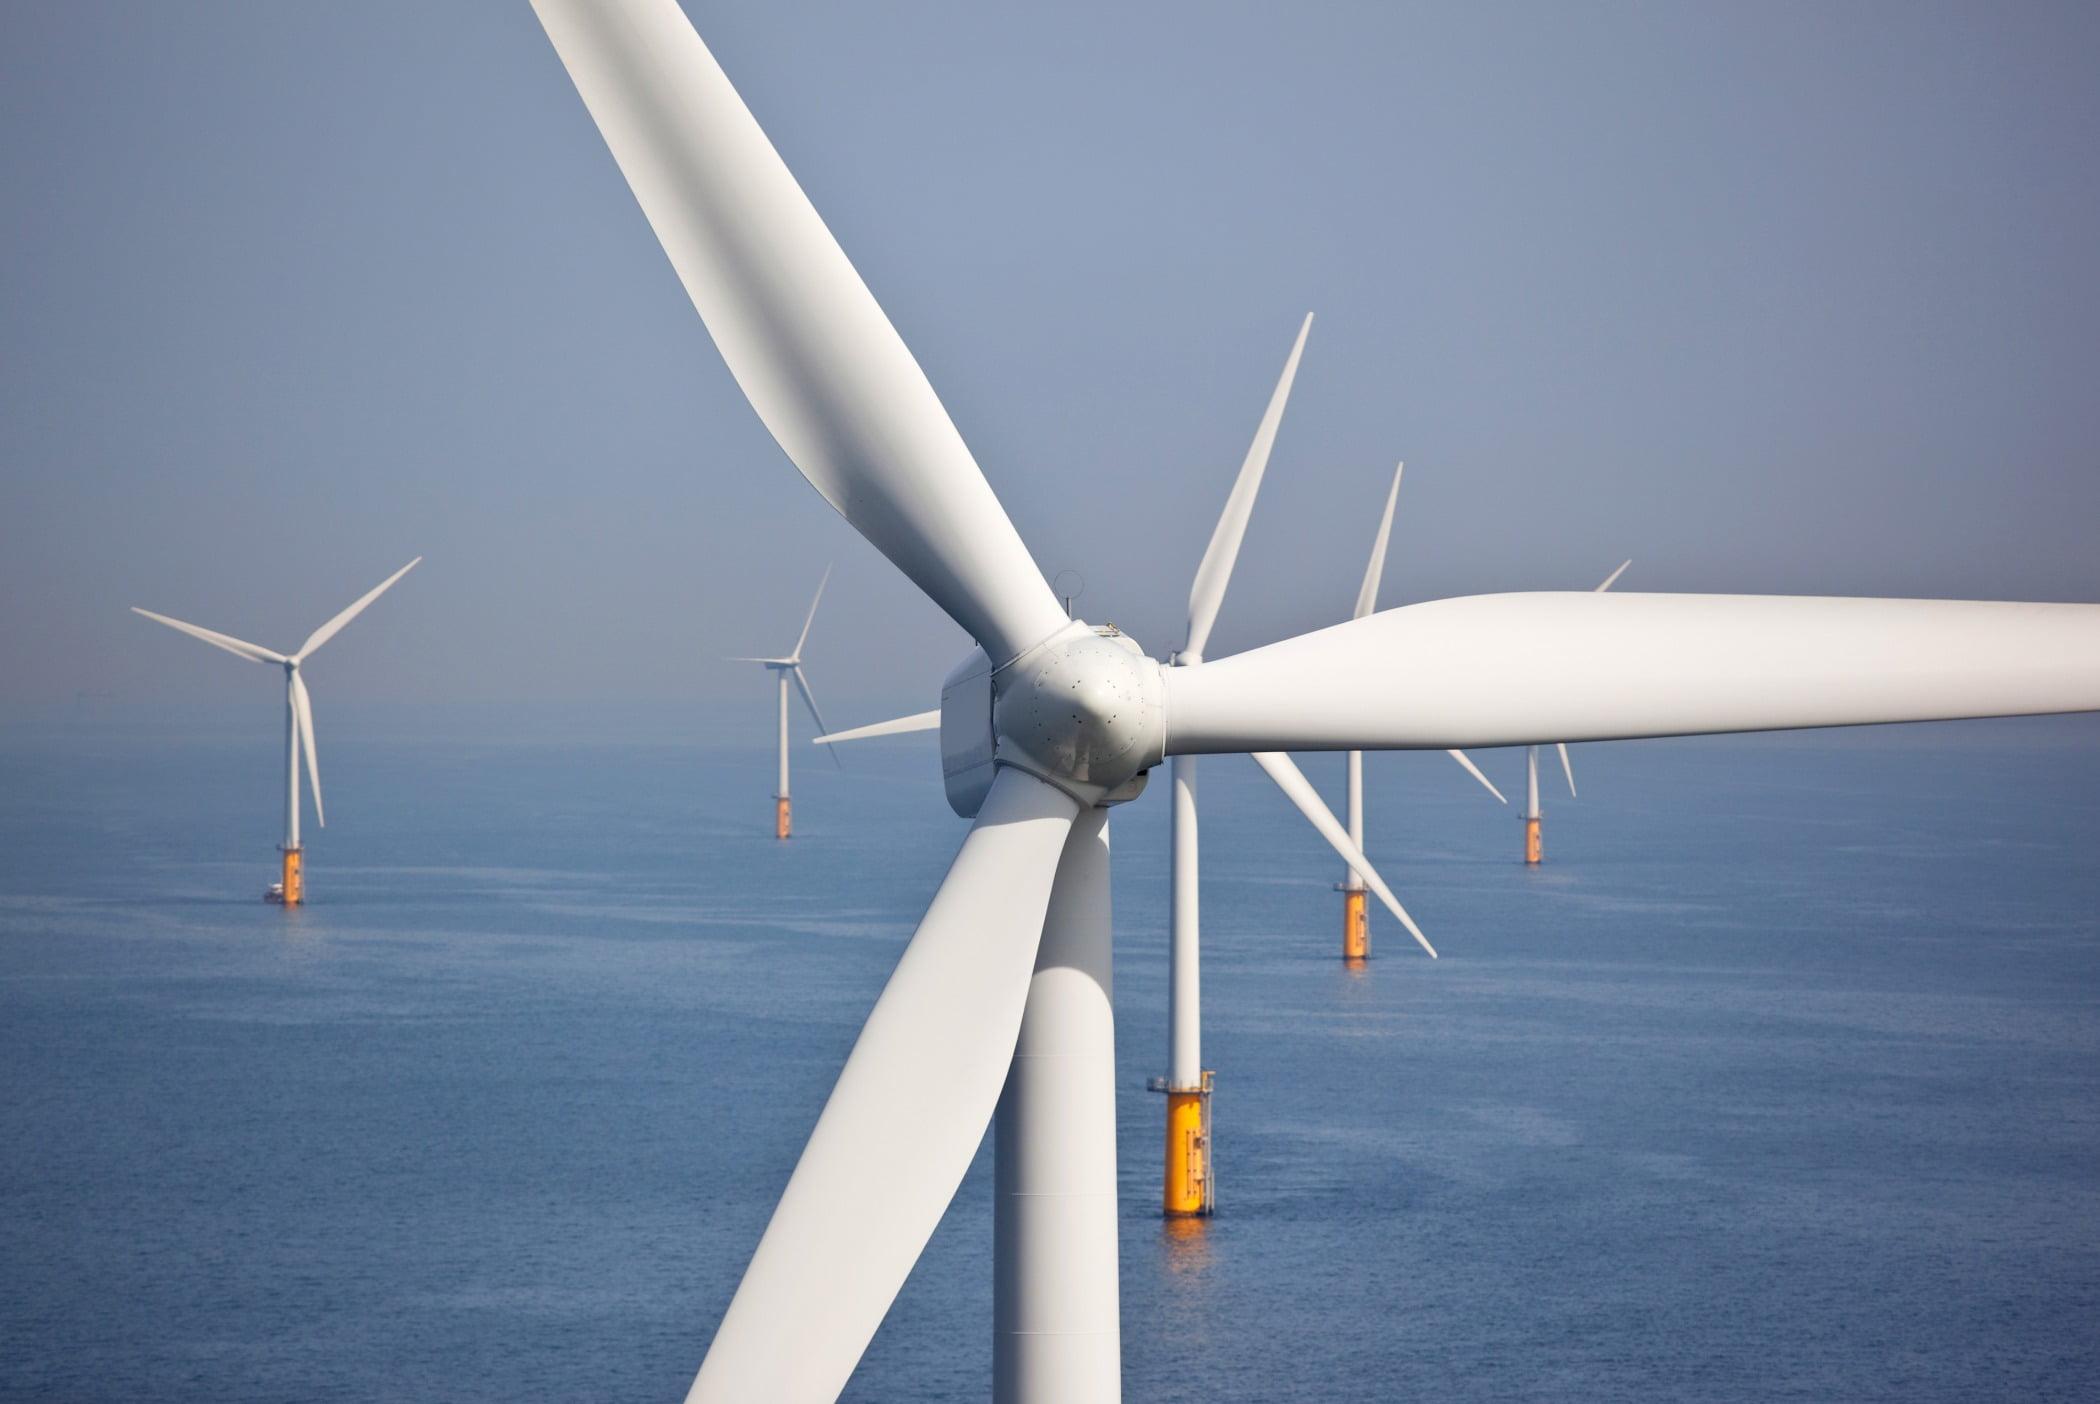 Wind farm, Windmill, Sky, Nature, Propeller, Turbine, Line